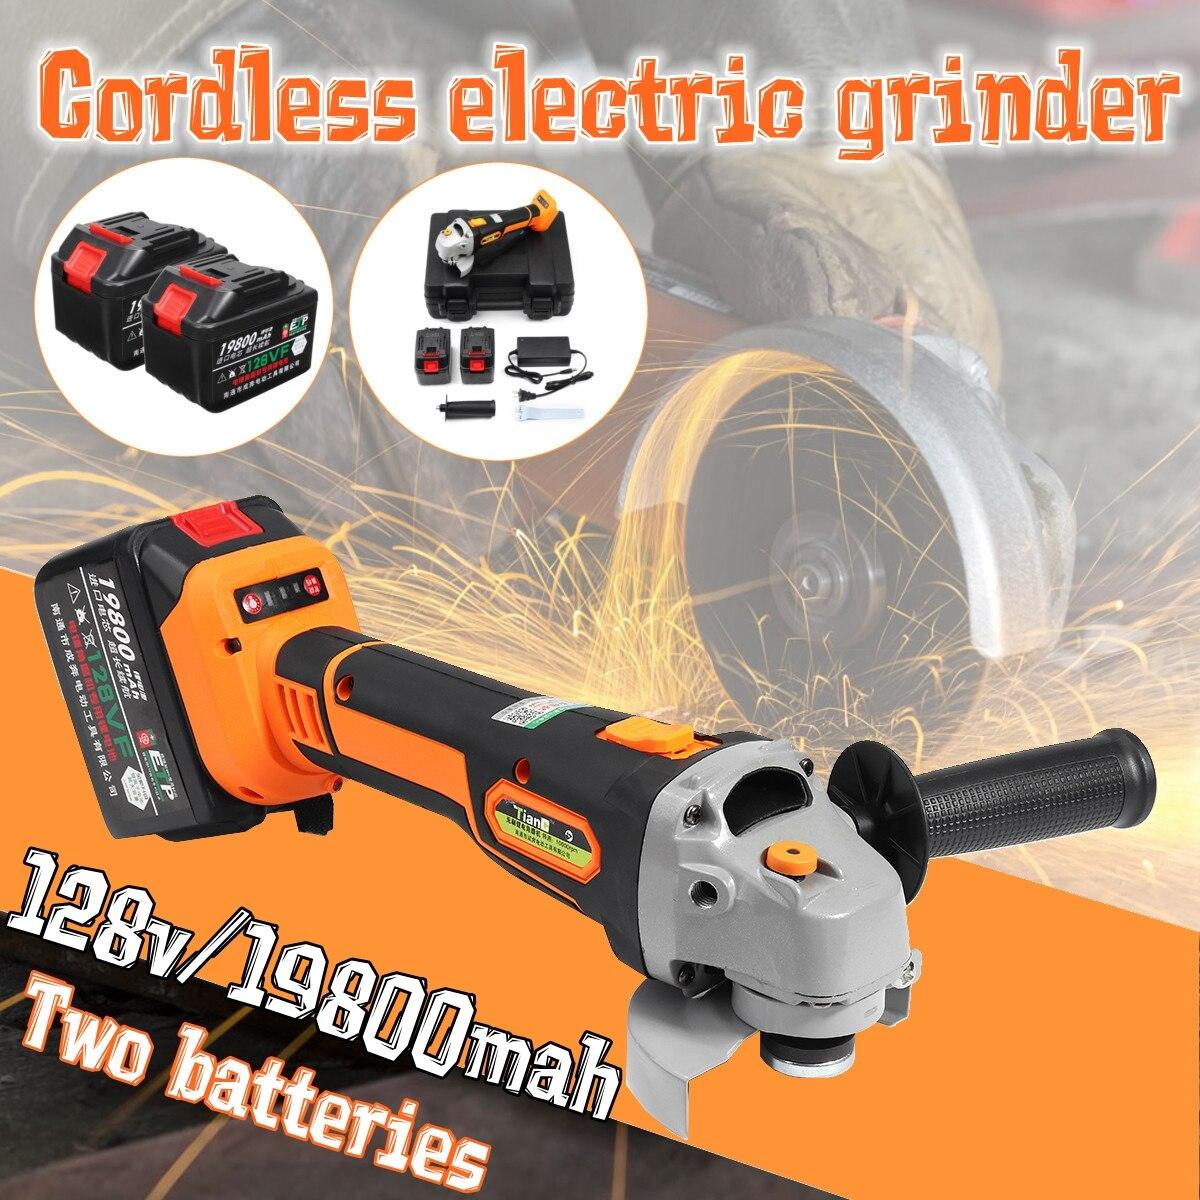 128Vf 19800mAh Electric Angle Grinder Cordless Polisher Polishing Machine Cutting Tool Brushless motor Grinding +1/2 Battery